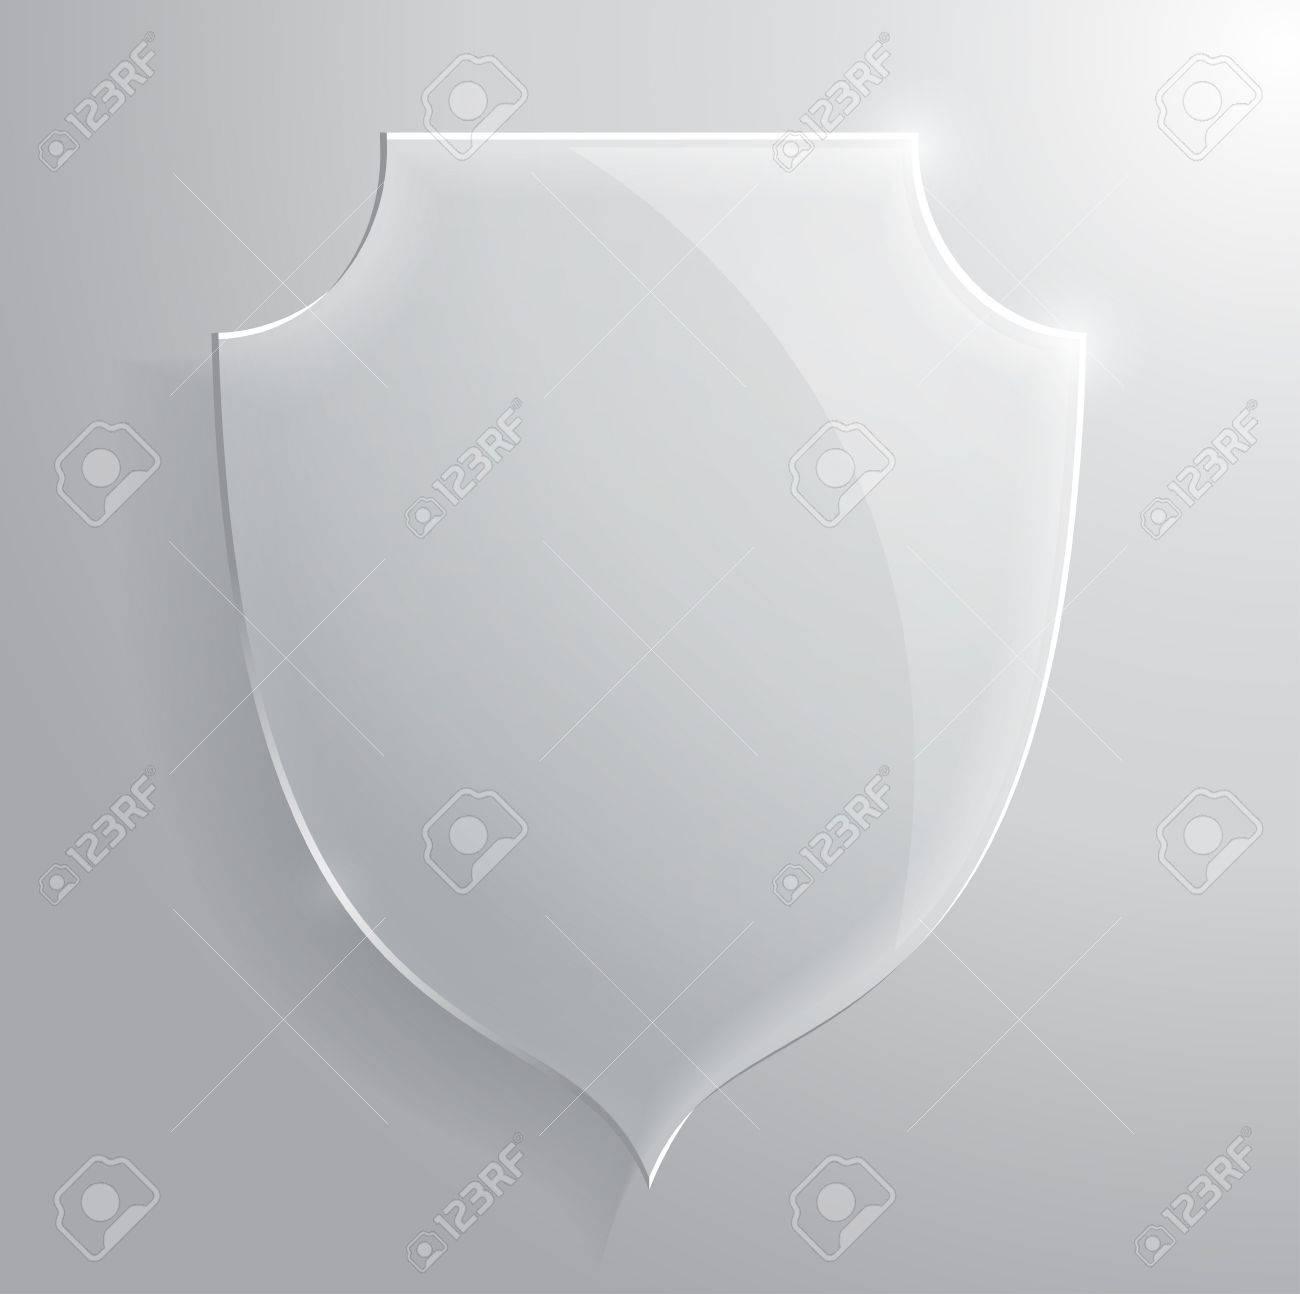 Glass transparent shield. Vector illustration. - 30917843